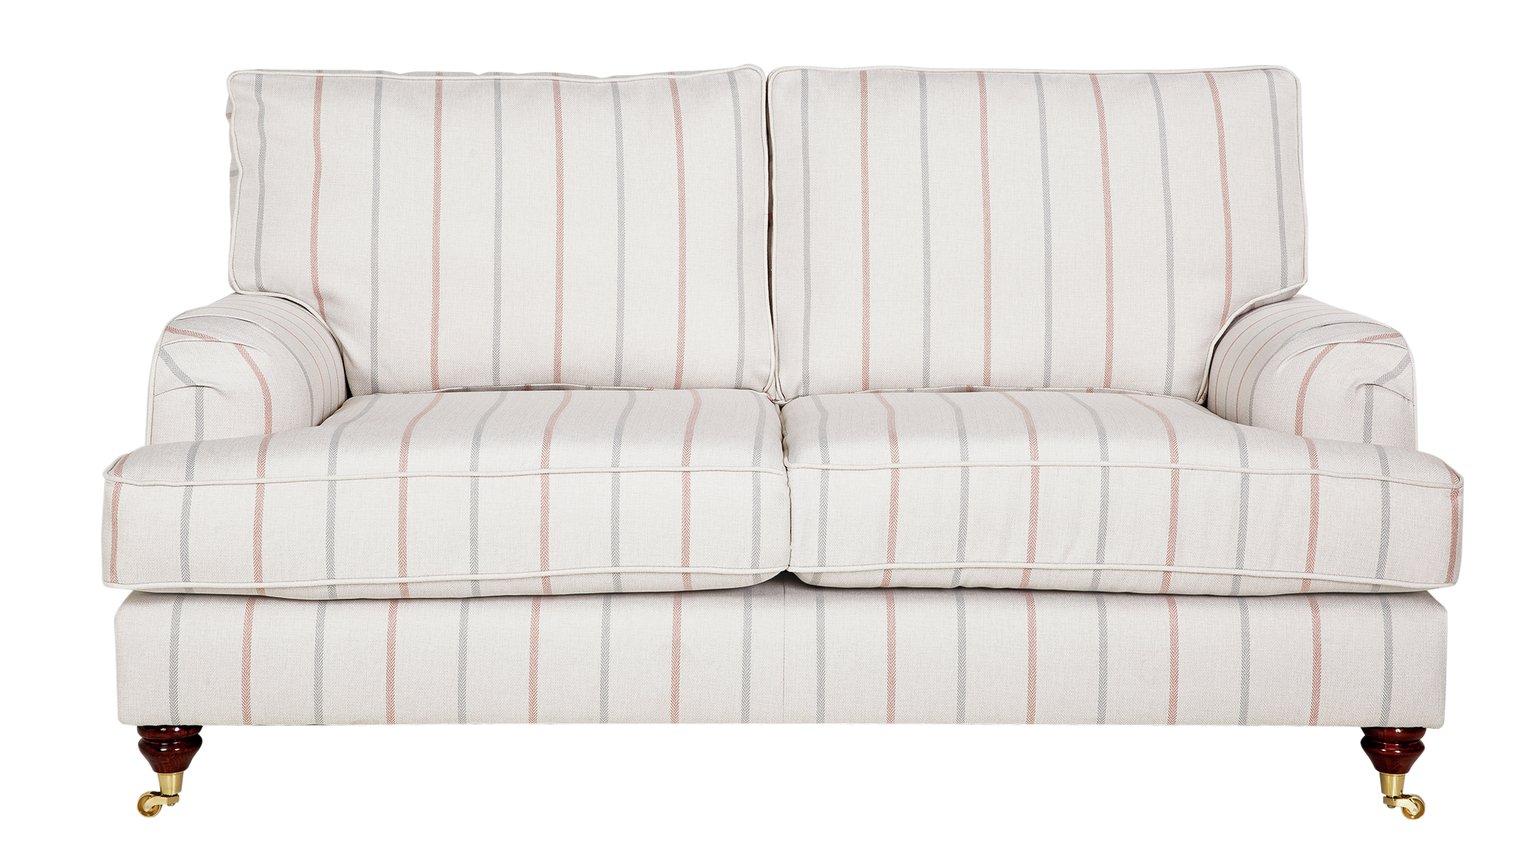 Argos Home Abberton 2 Seater Fabric Sofa review